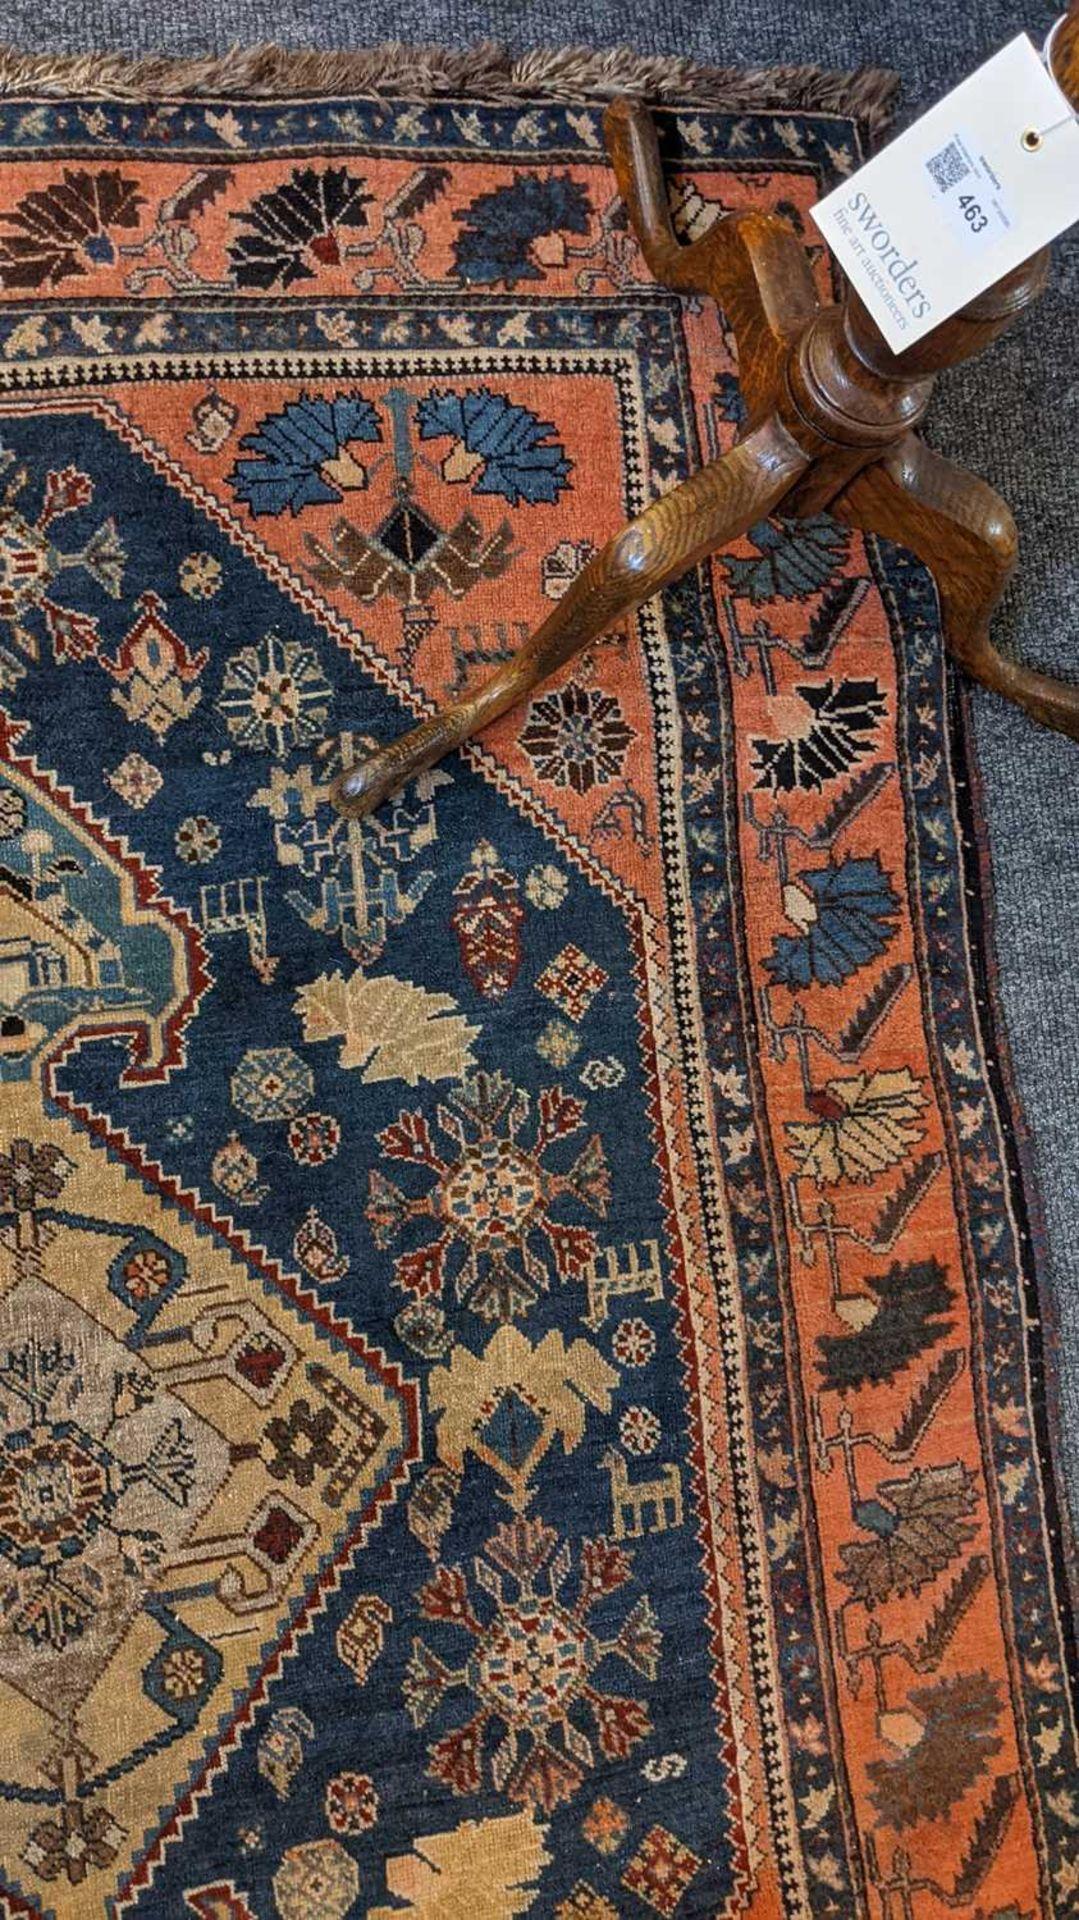 An Afghan Beshir rug, - Image 15 of 17